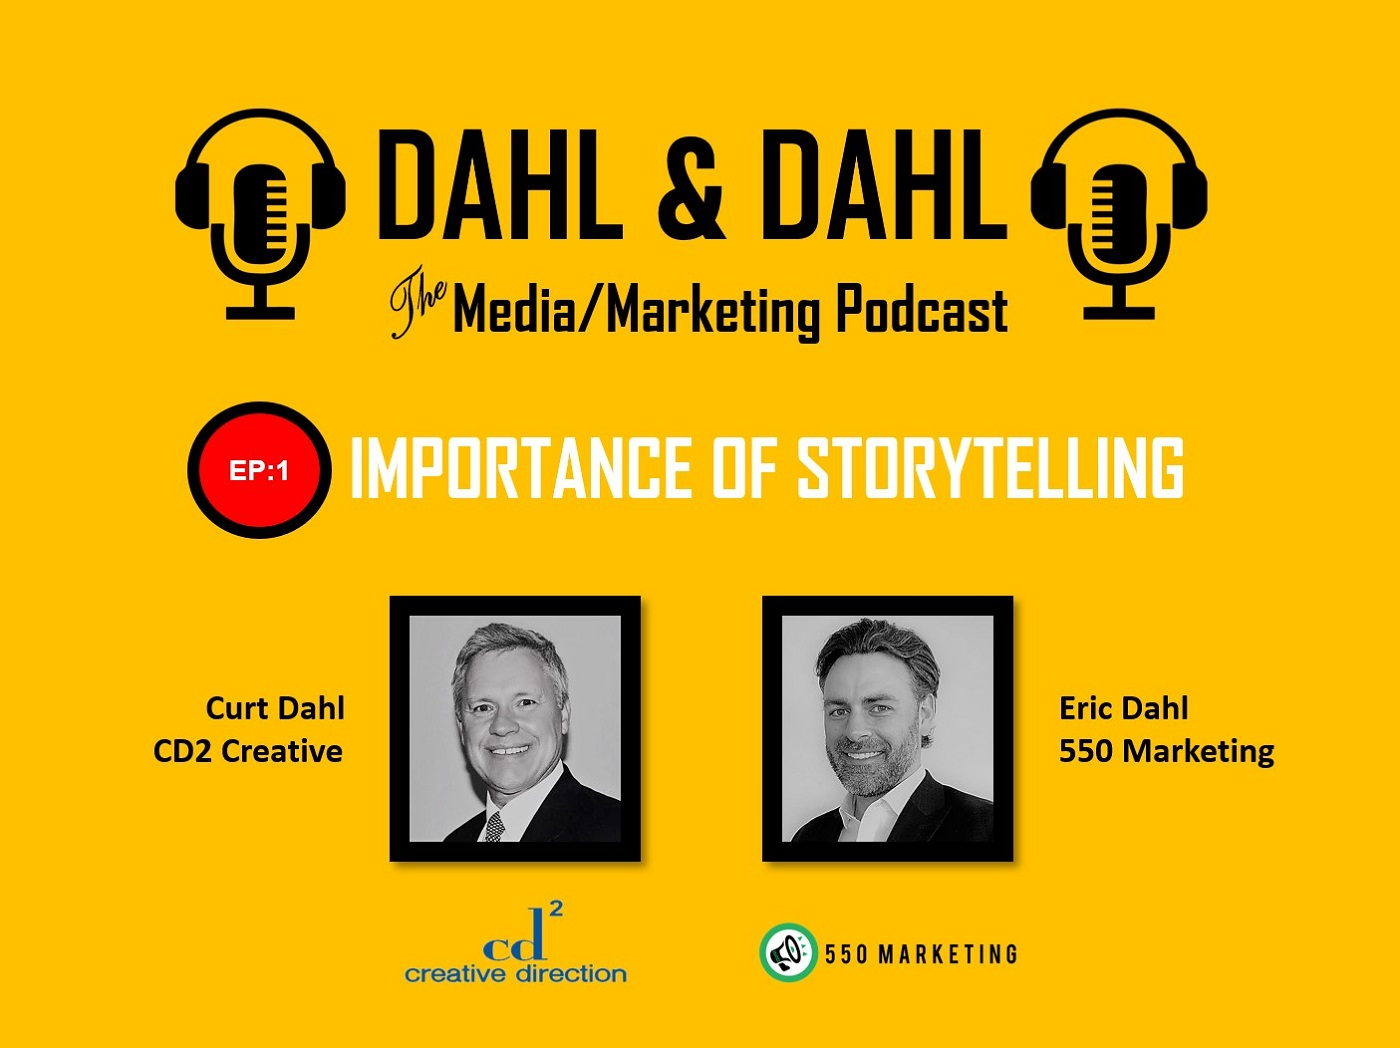 Dahl & Dahl Media Marketing Podcast 1 Curt Dahl Eric Dahl